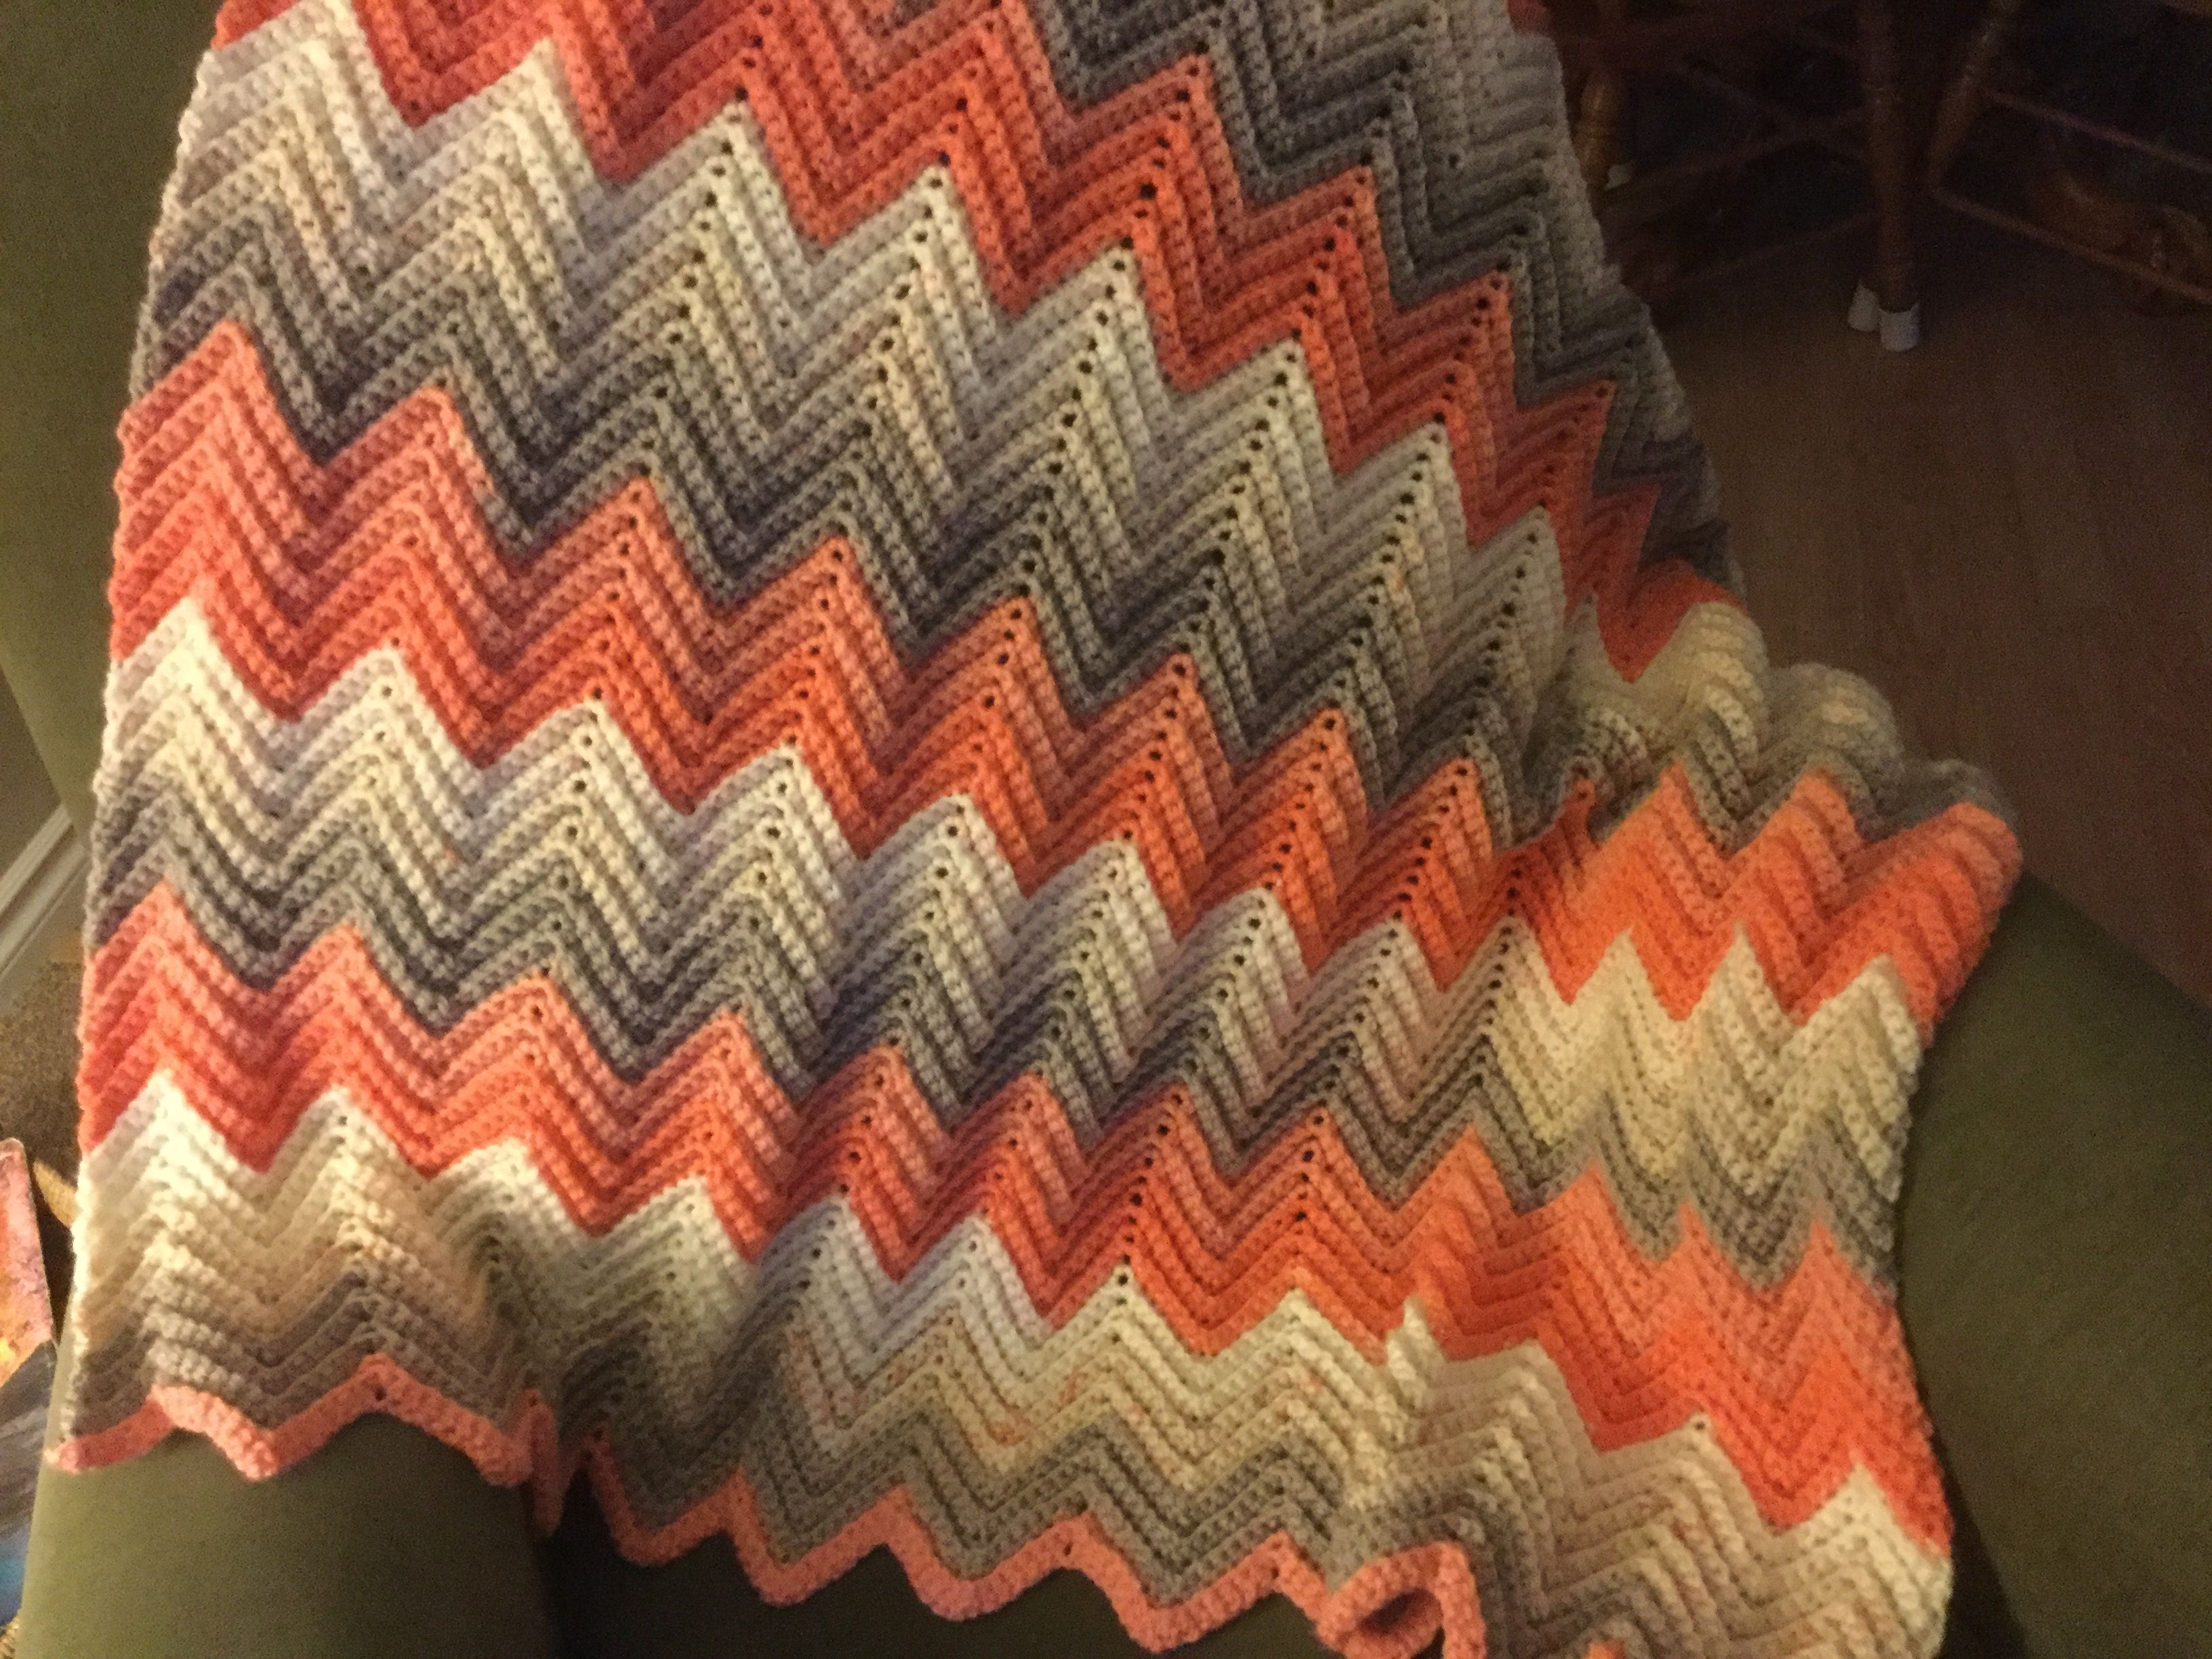 Single crochet ripple chevron afghan using Caron Cakes - strawberry ...